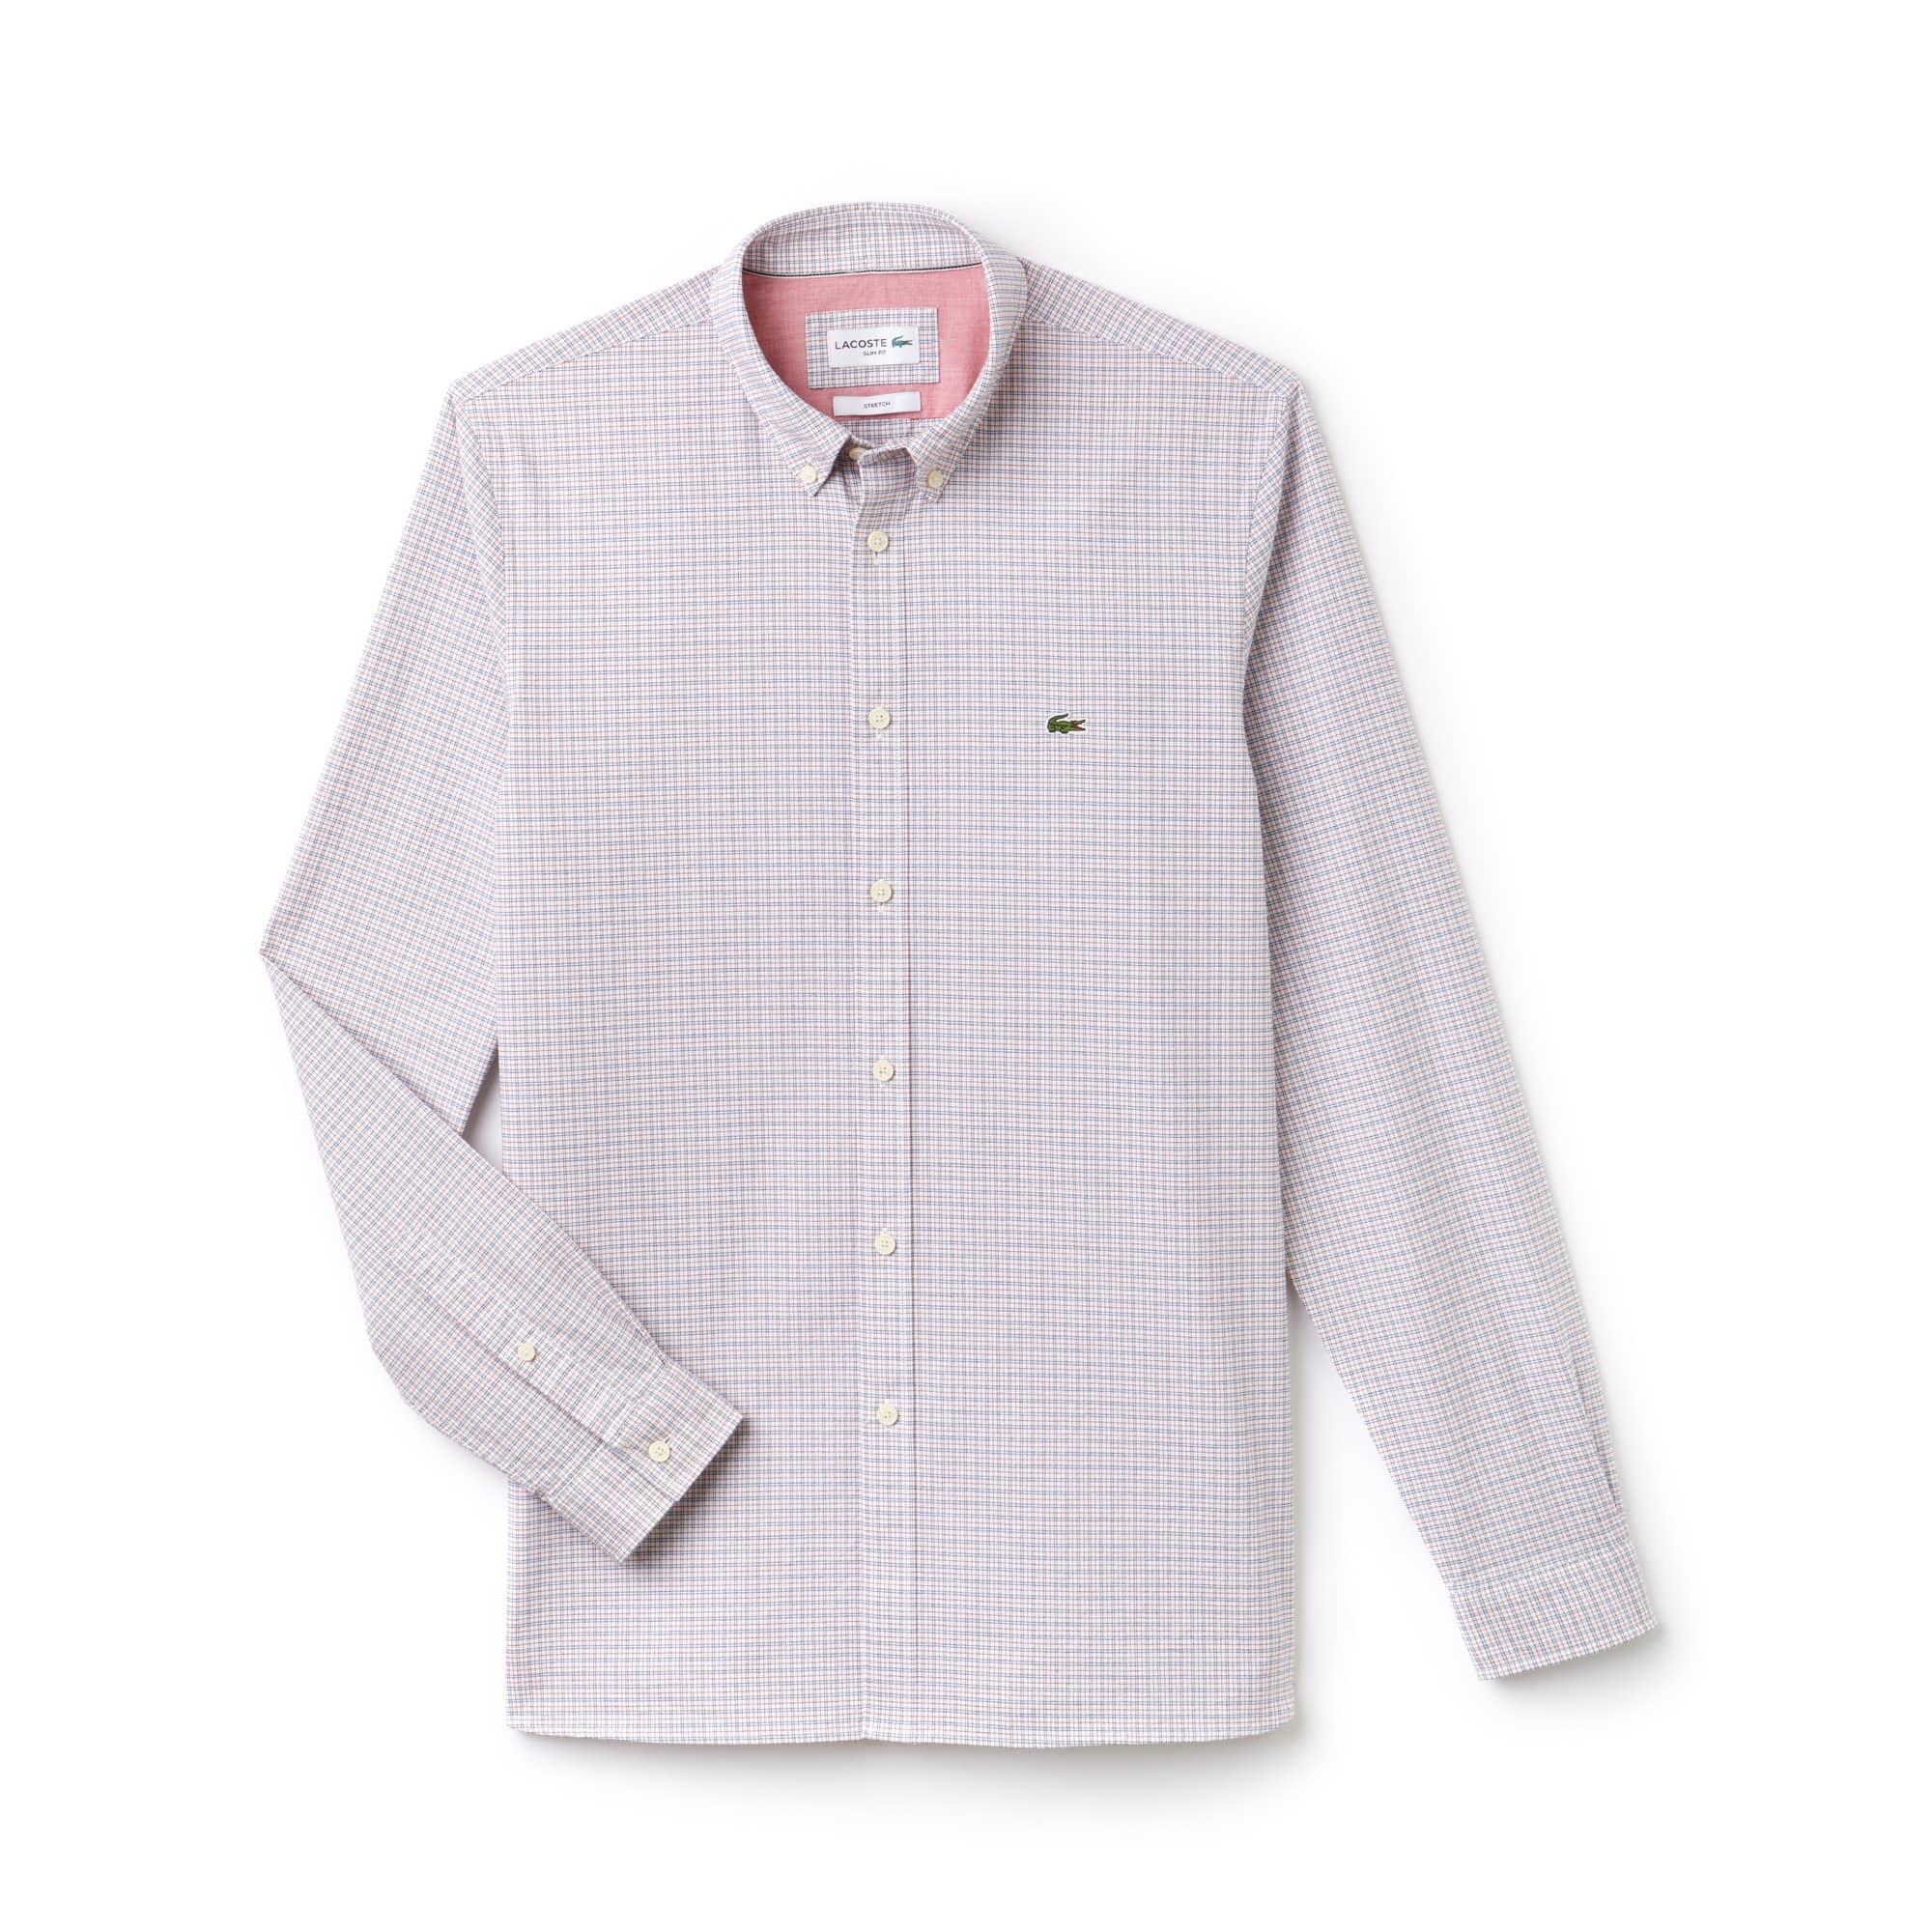 Men's Slim Fit Check Stretch Oxford Cotton Shirt